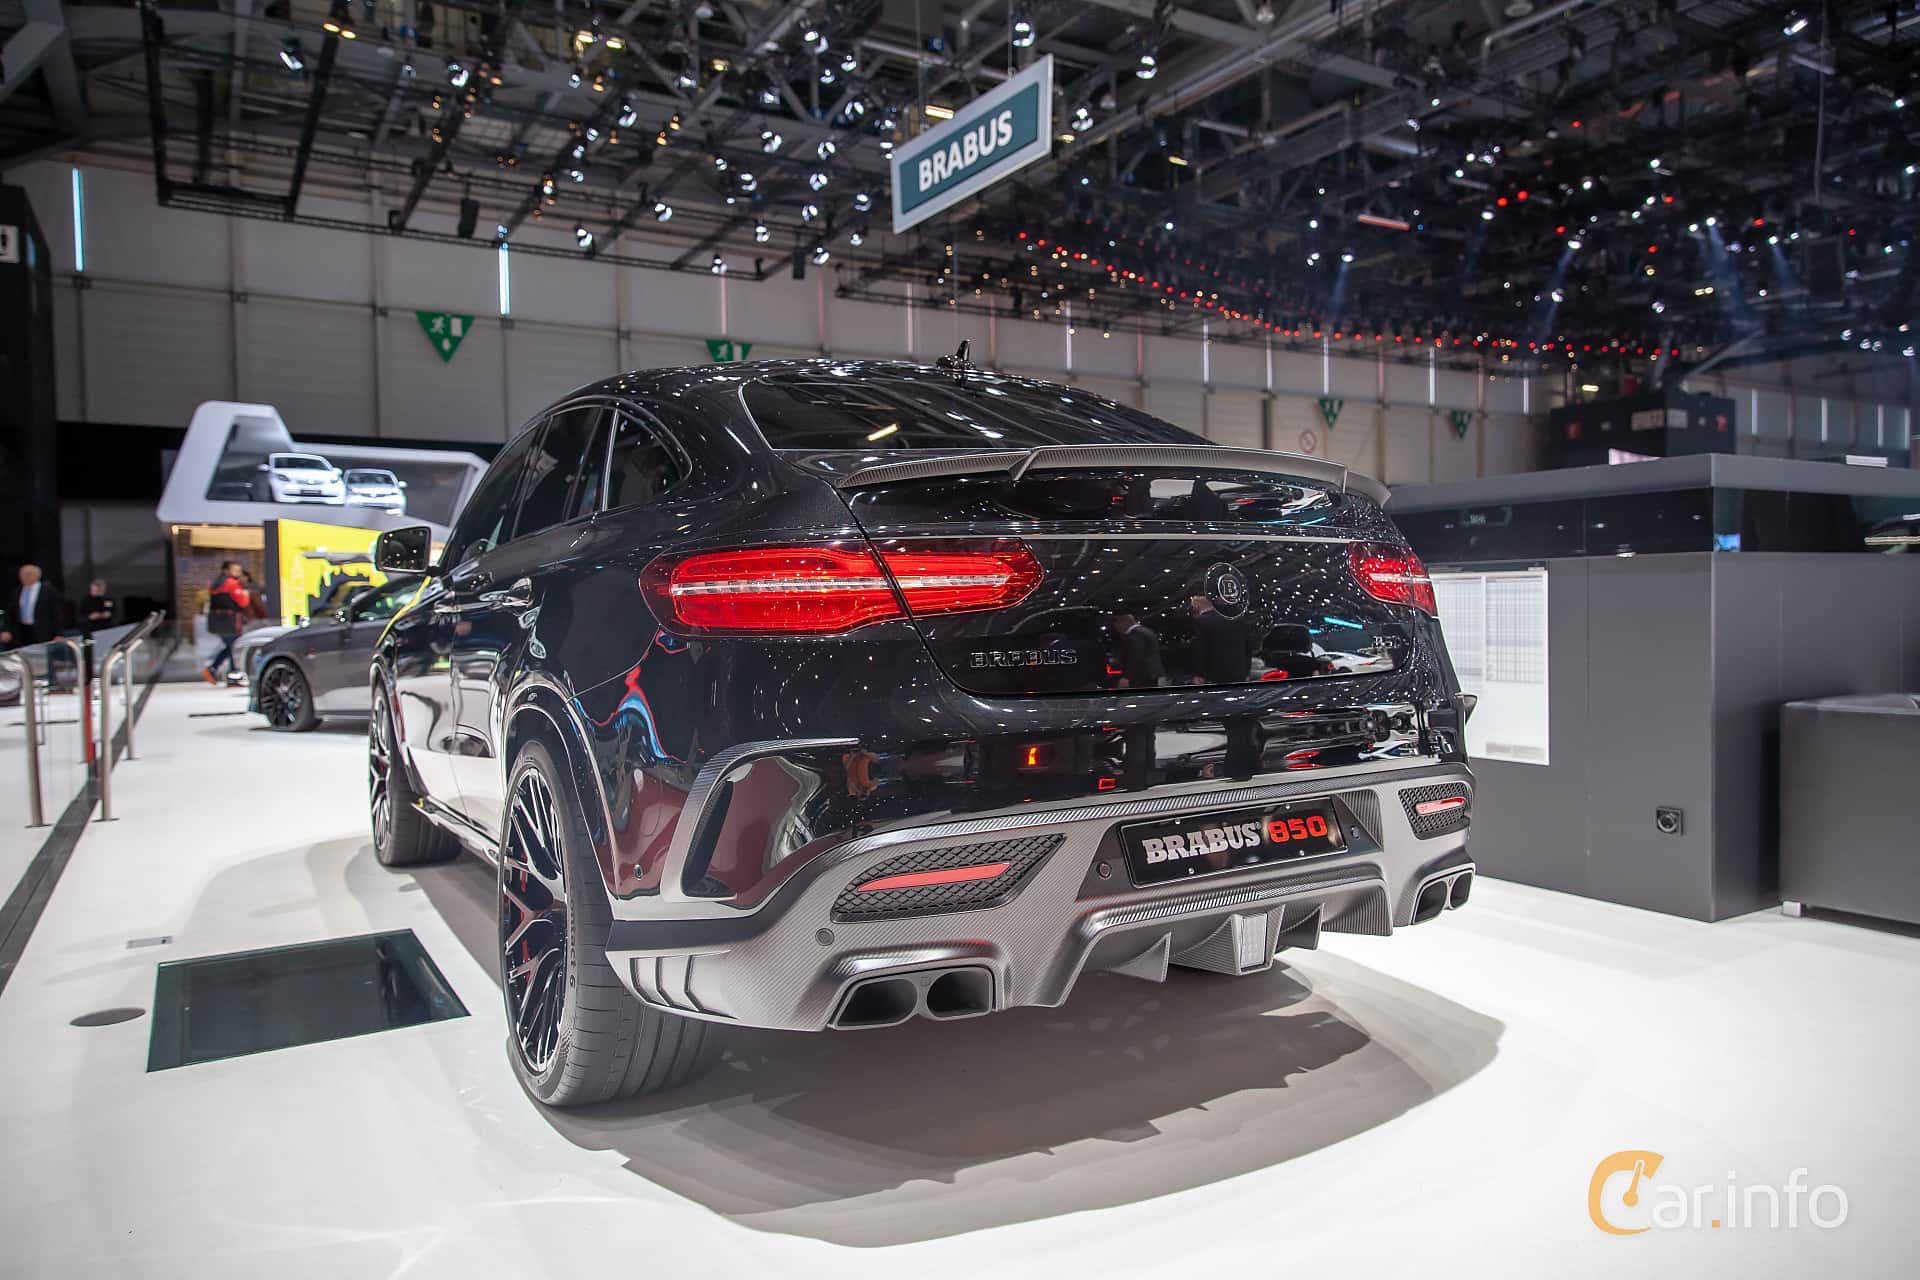 Brabus GLE 850 Coupé  AMG SpeedShift Plus 7G-Tronic, 850hp, 2019 at Geneva Motor Show 2019